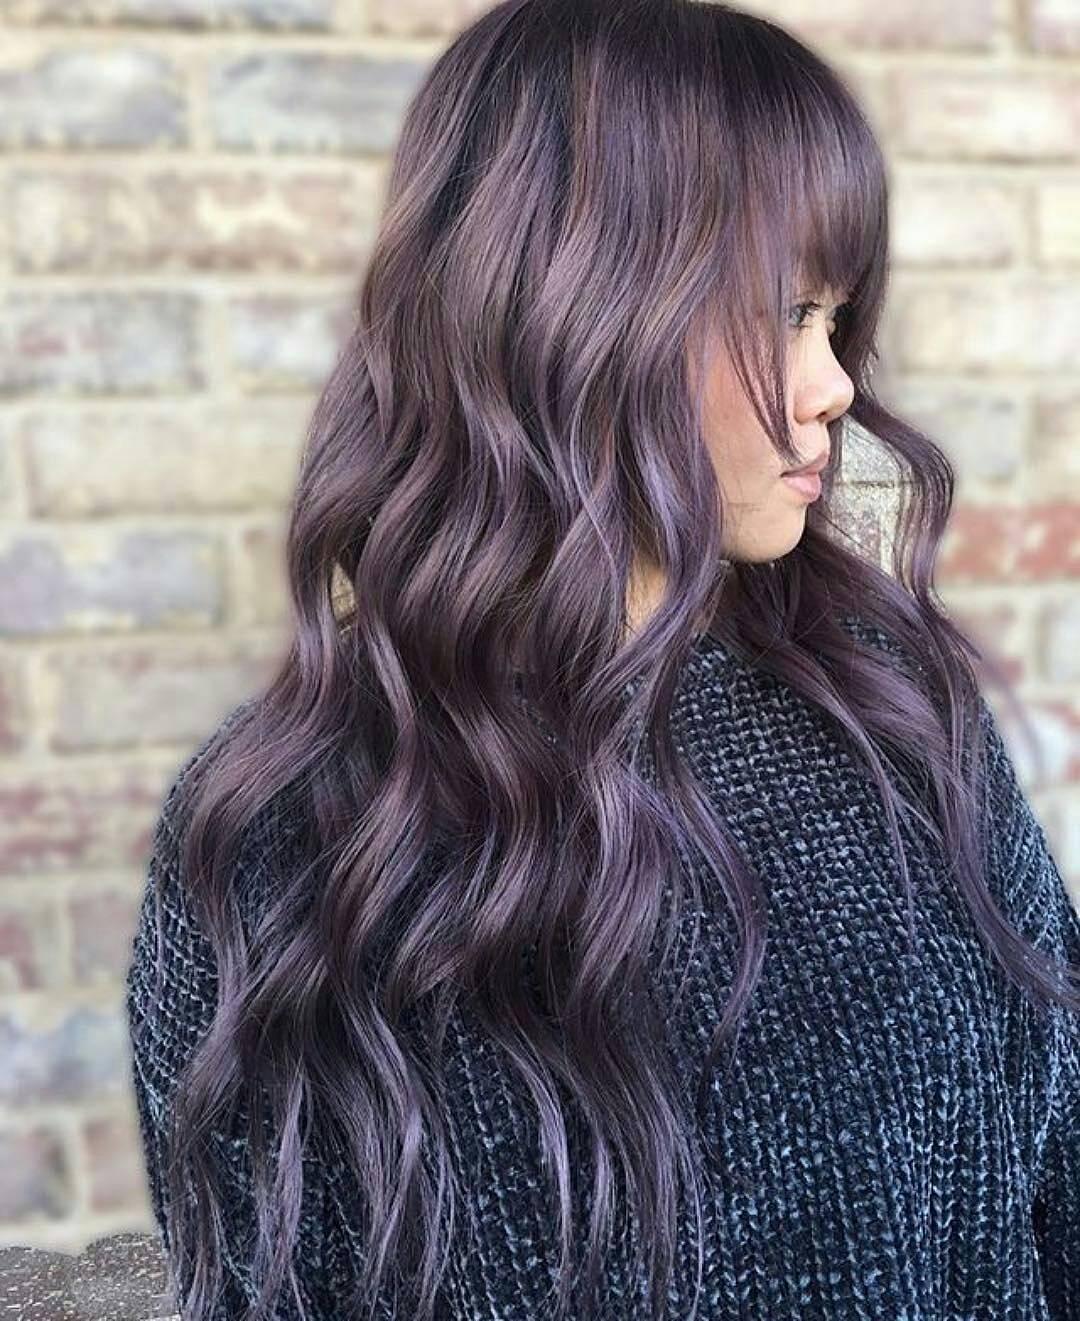 kuthaus_glendora-long-wavy-hair